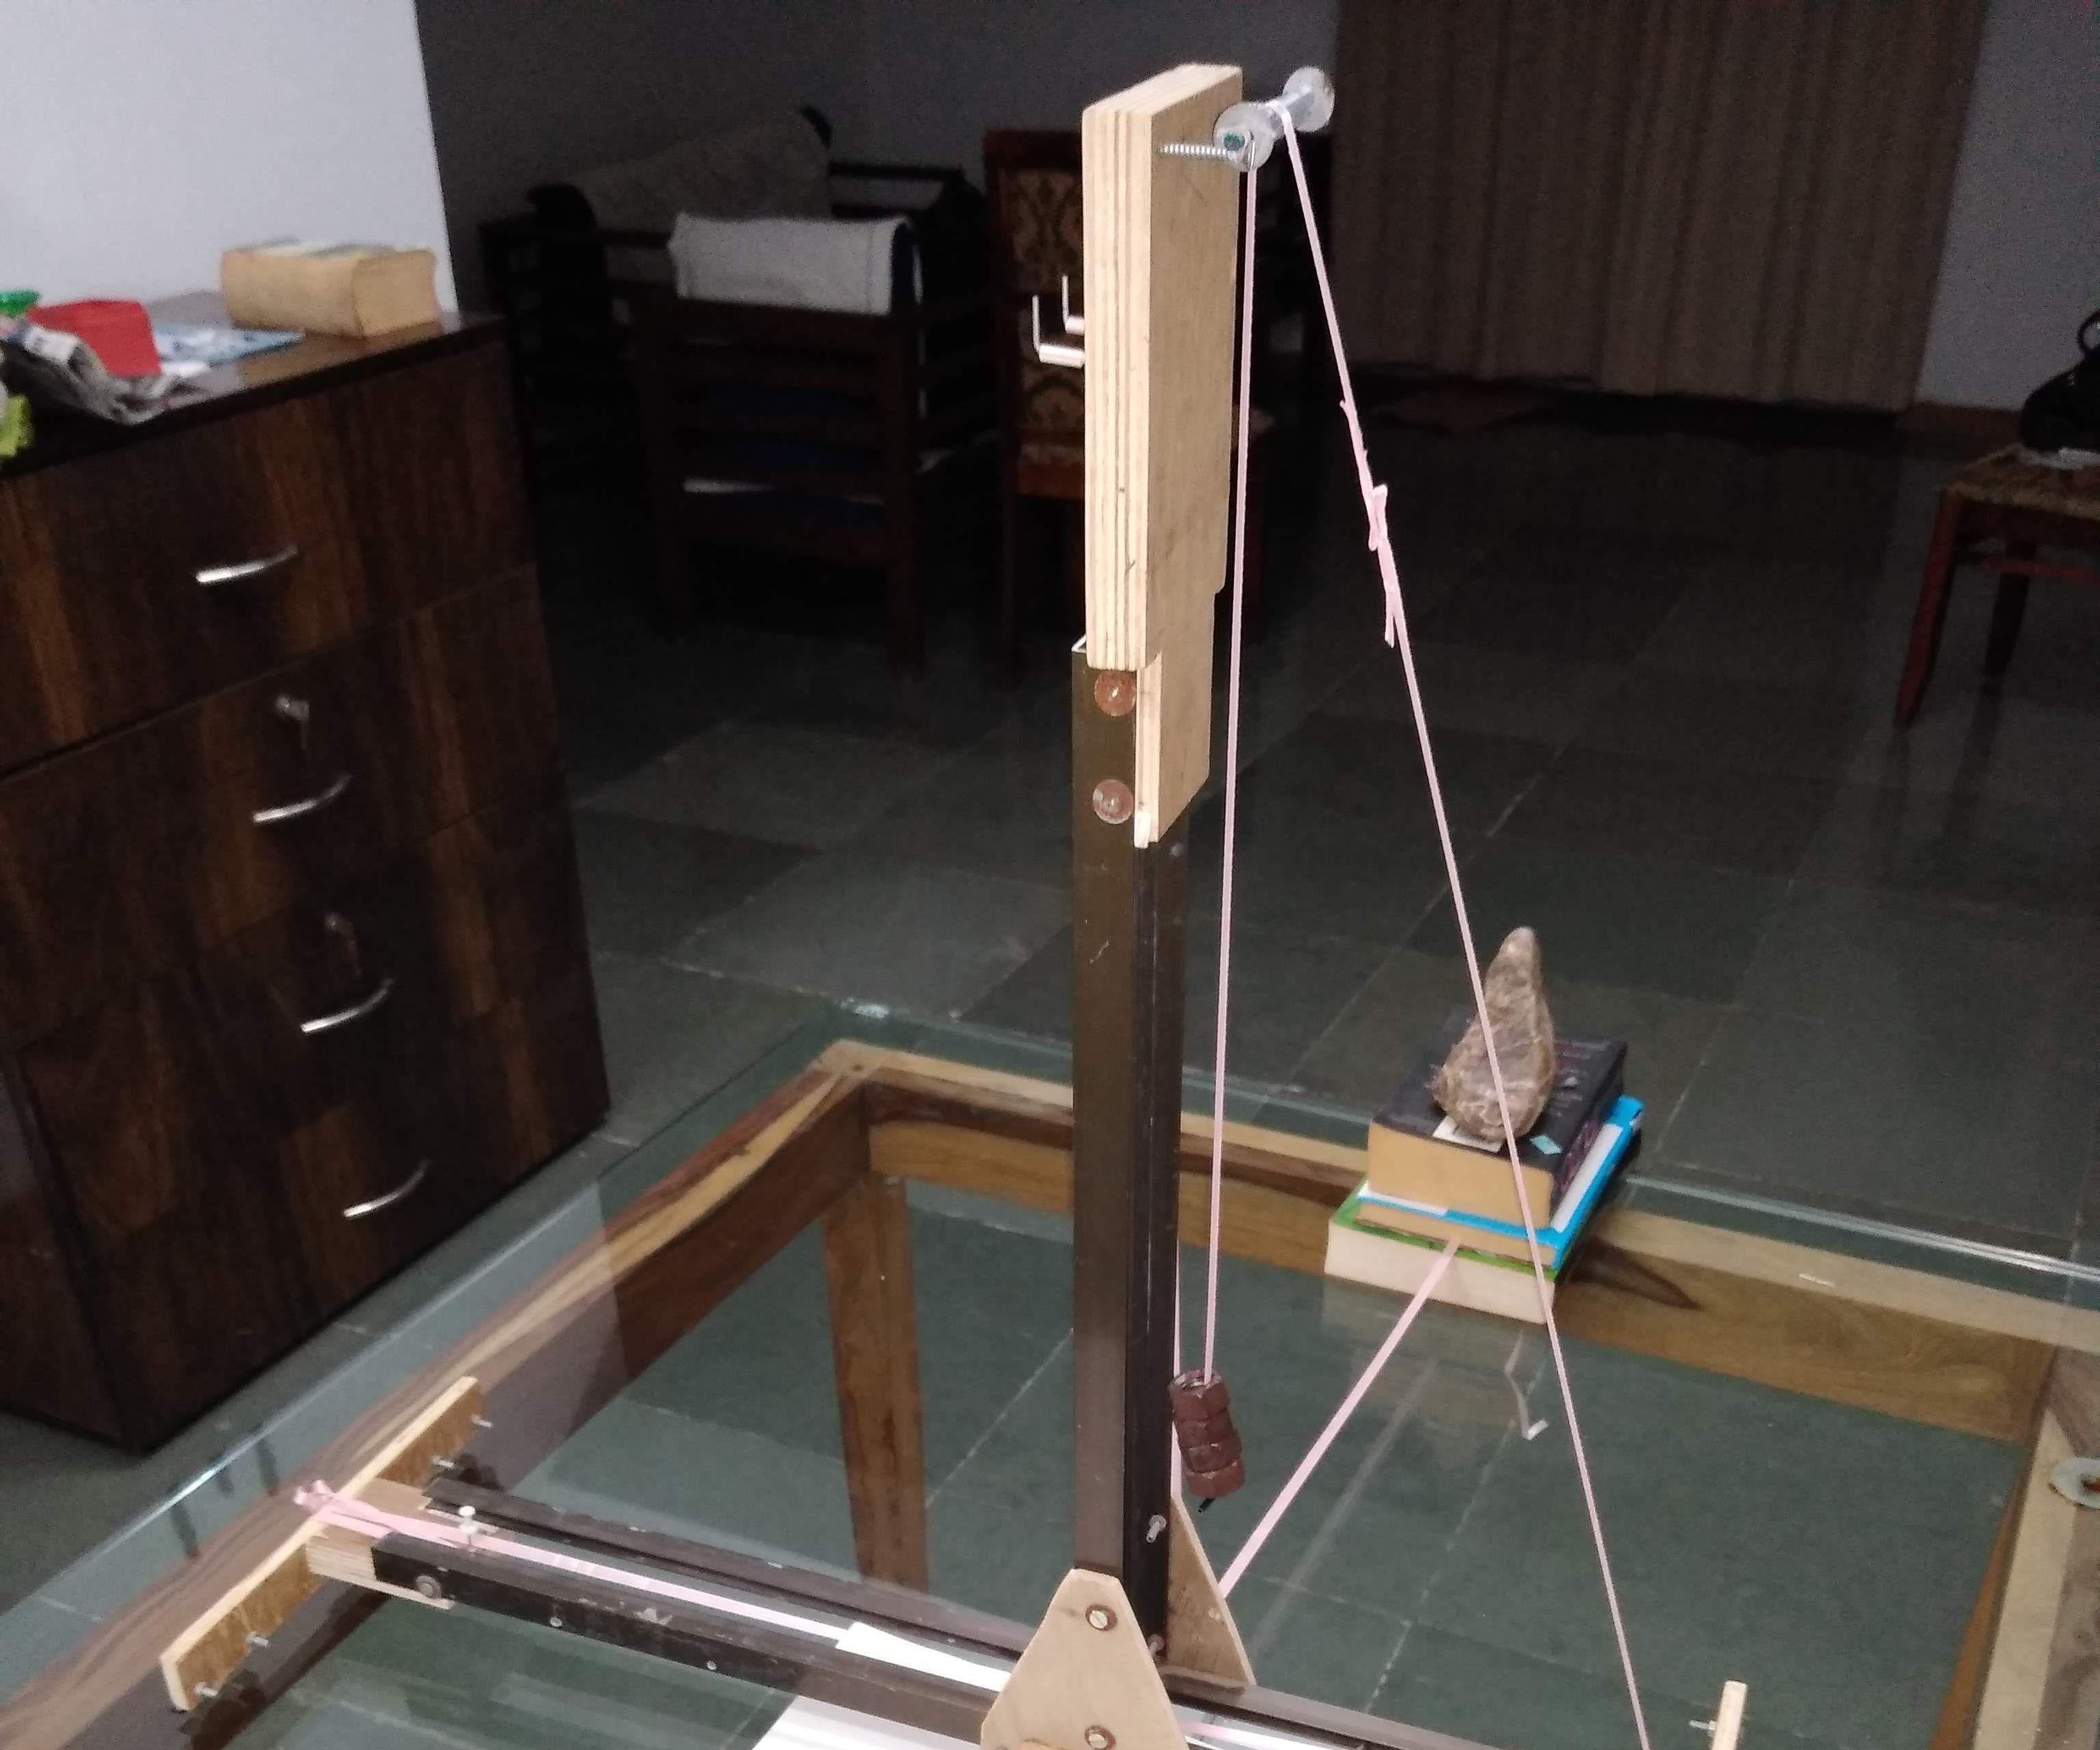 Gravity Assisted Upturned T Arch Maker (GAUTAM)